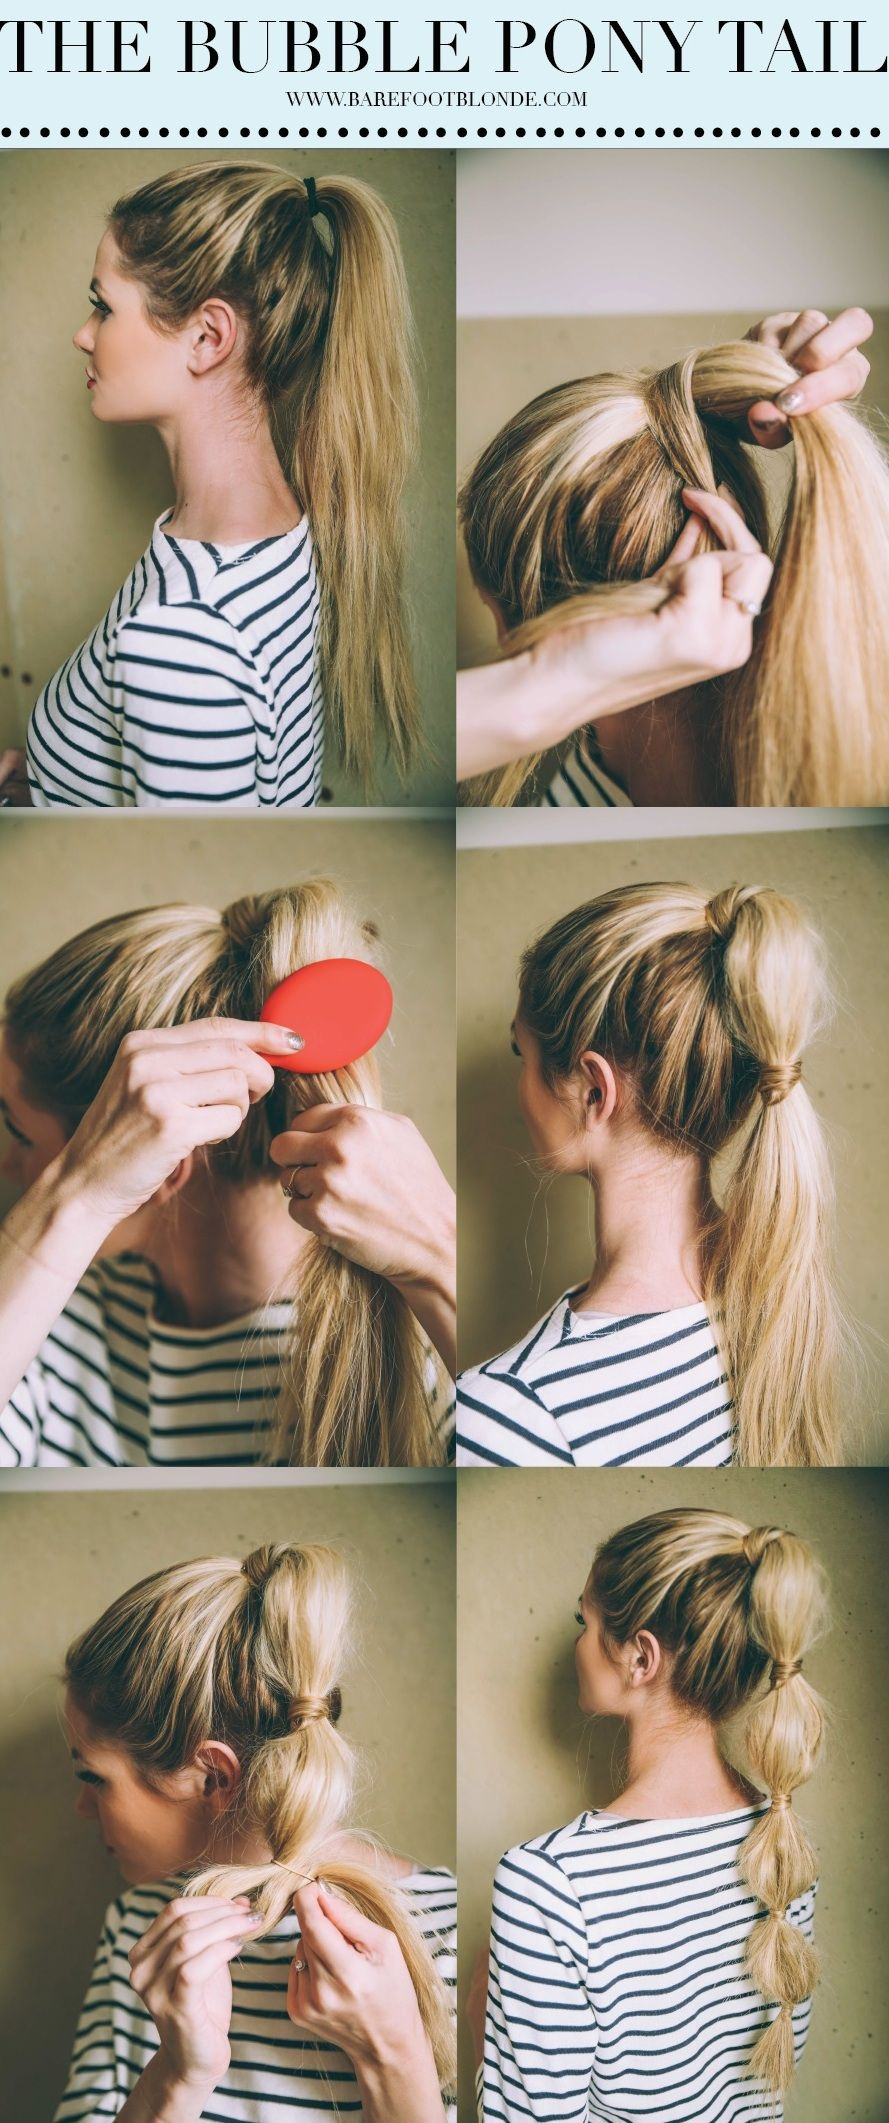 Bubble pony amazing hairstyles pinterest barefoot blonde